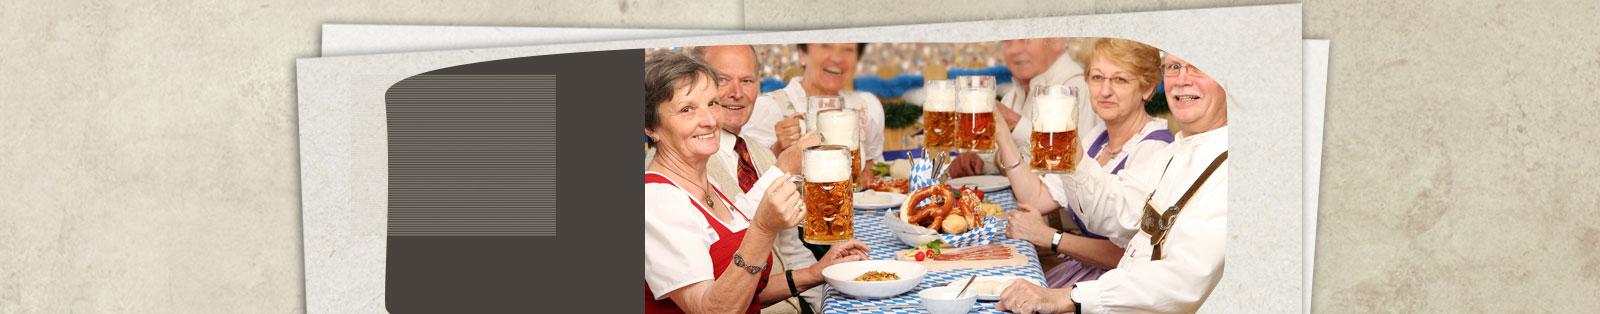 Ristorante birreria bavarese firenze